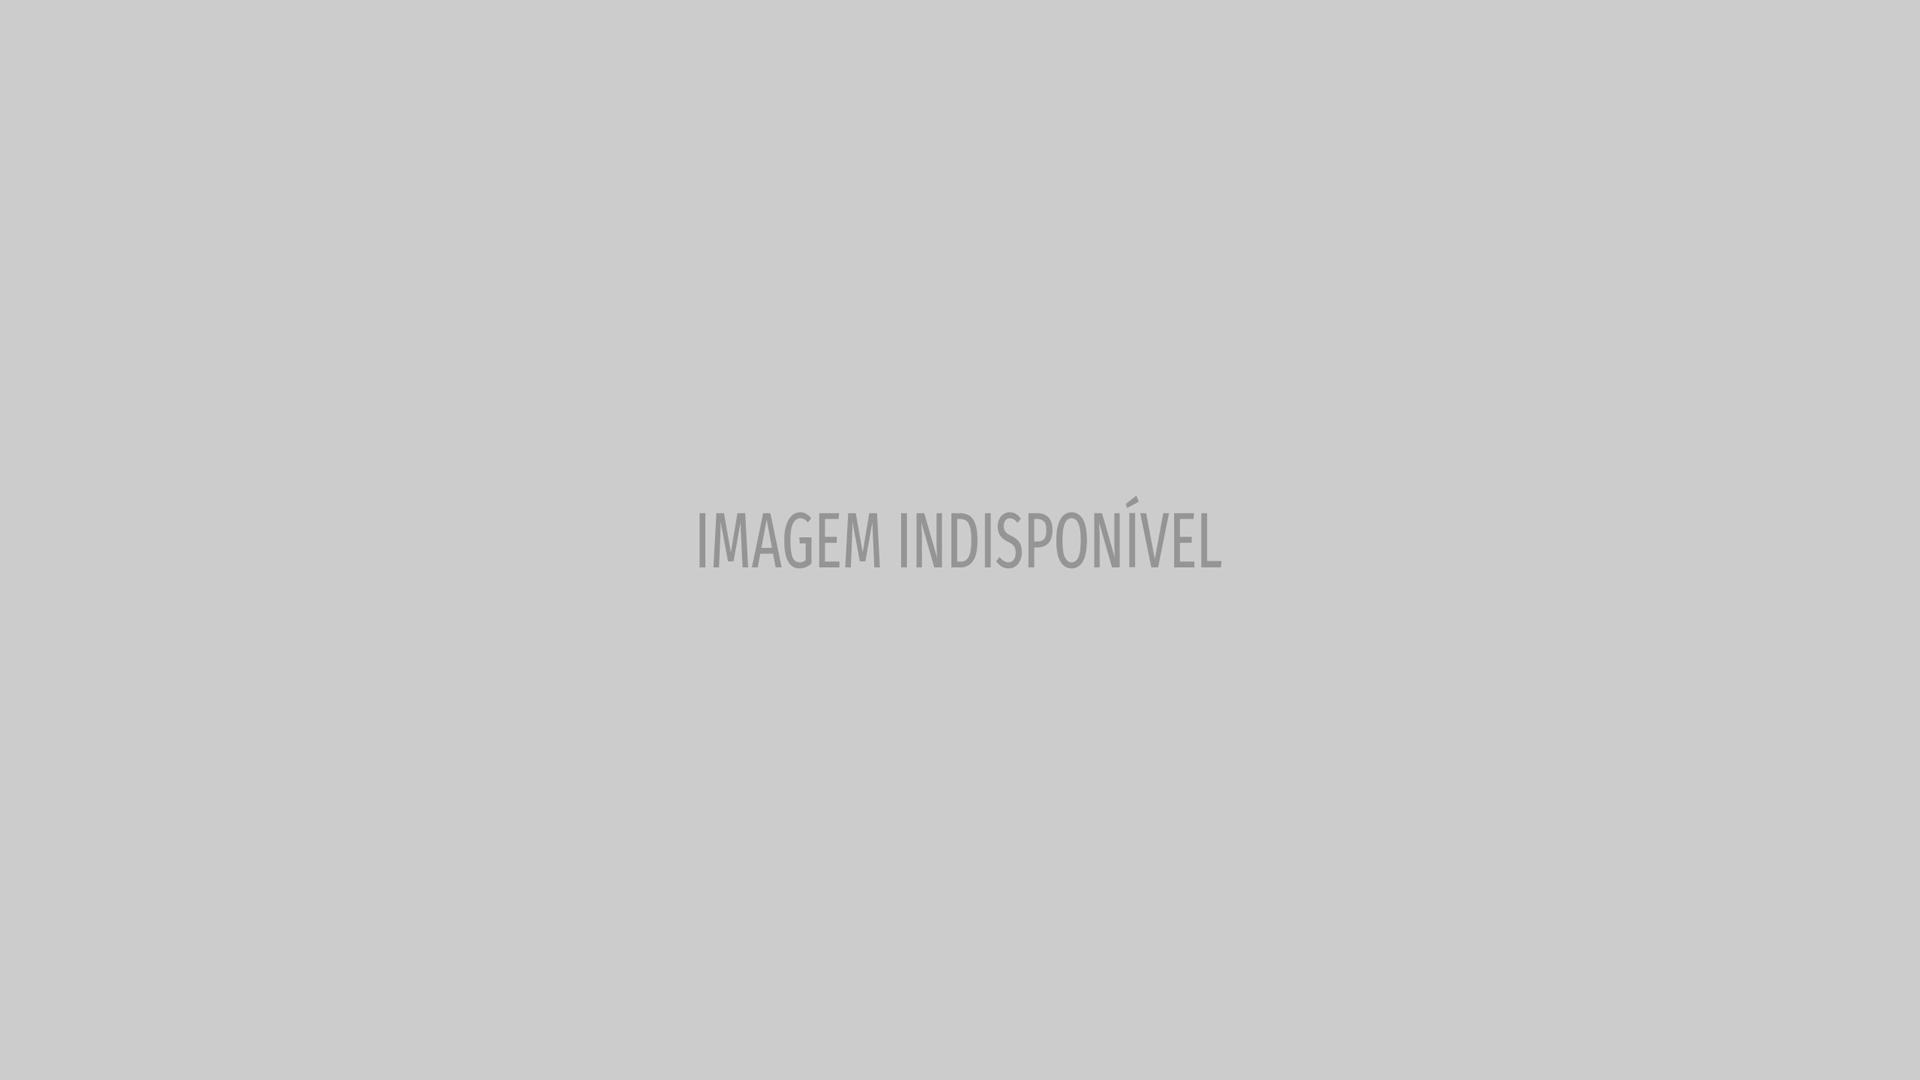 Carlos Costa levou 40 looks diferentes para o 'Love On Top'